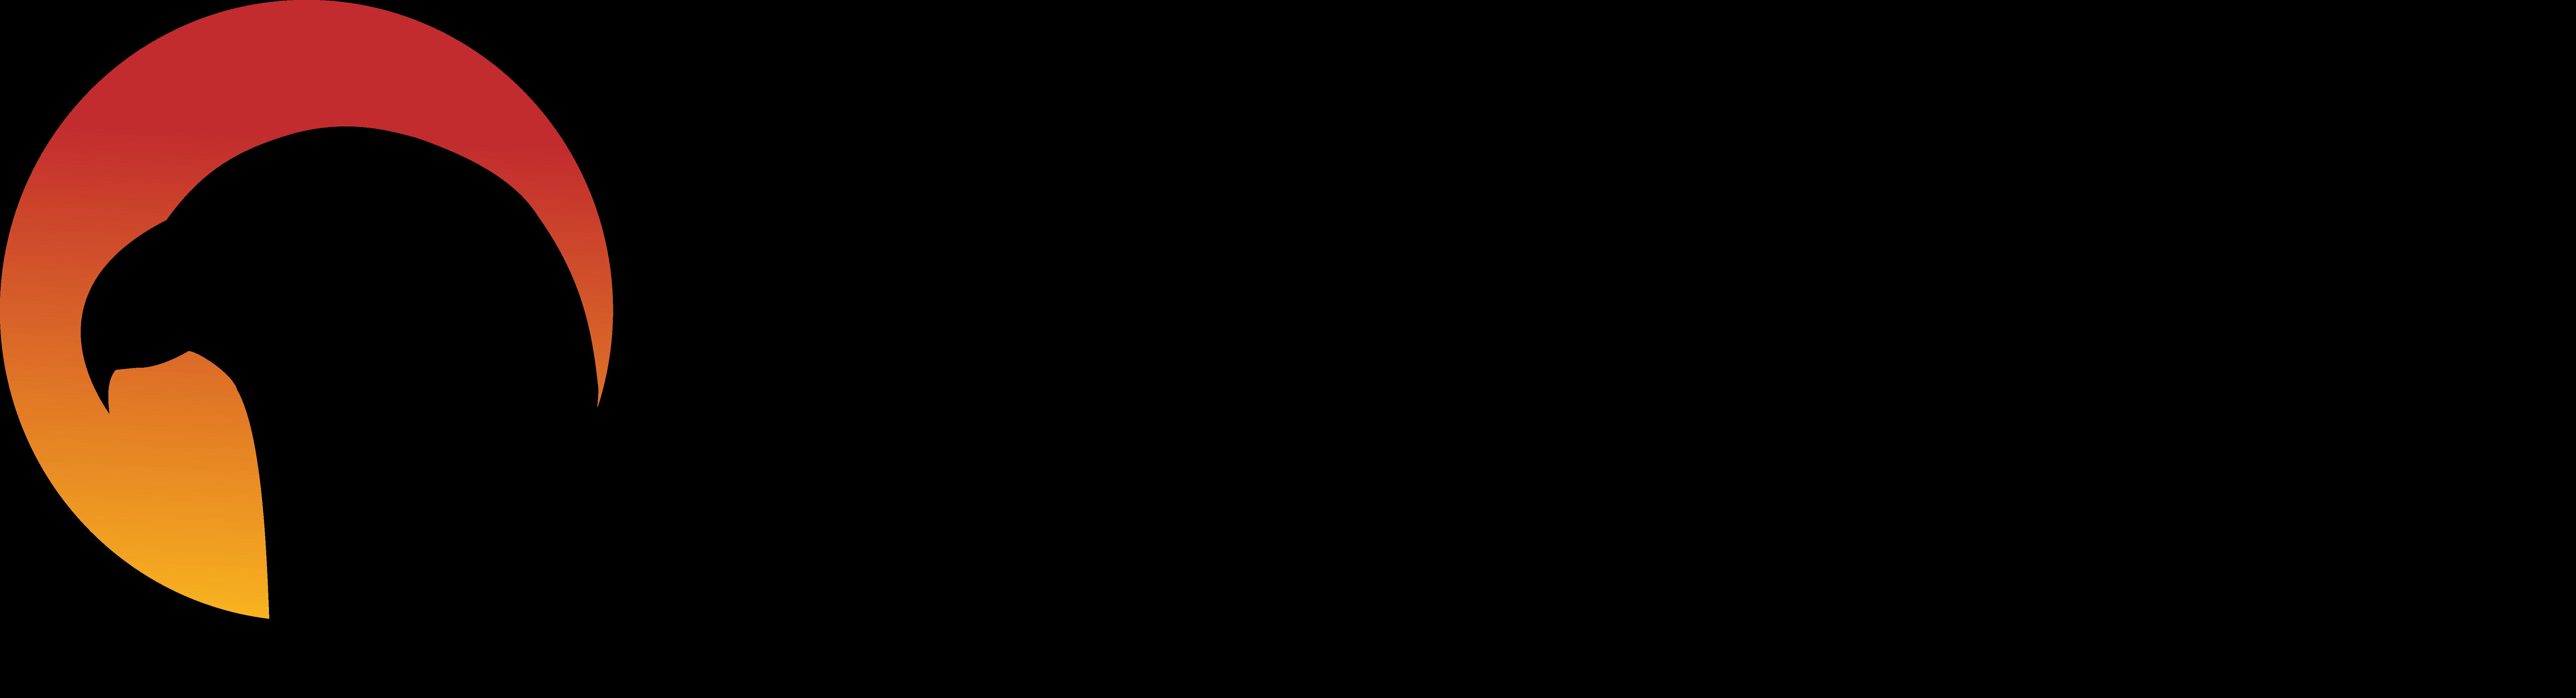 AgWare UAAR